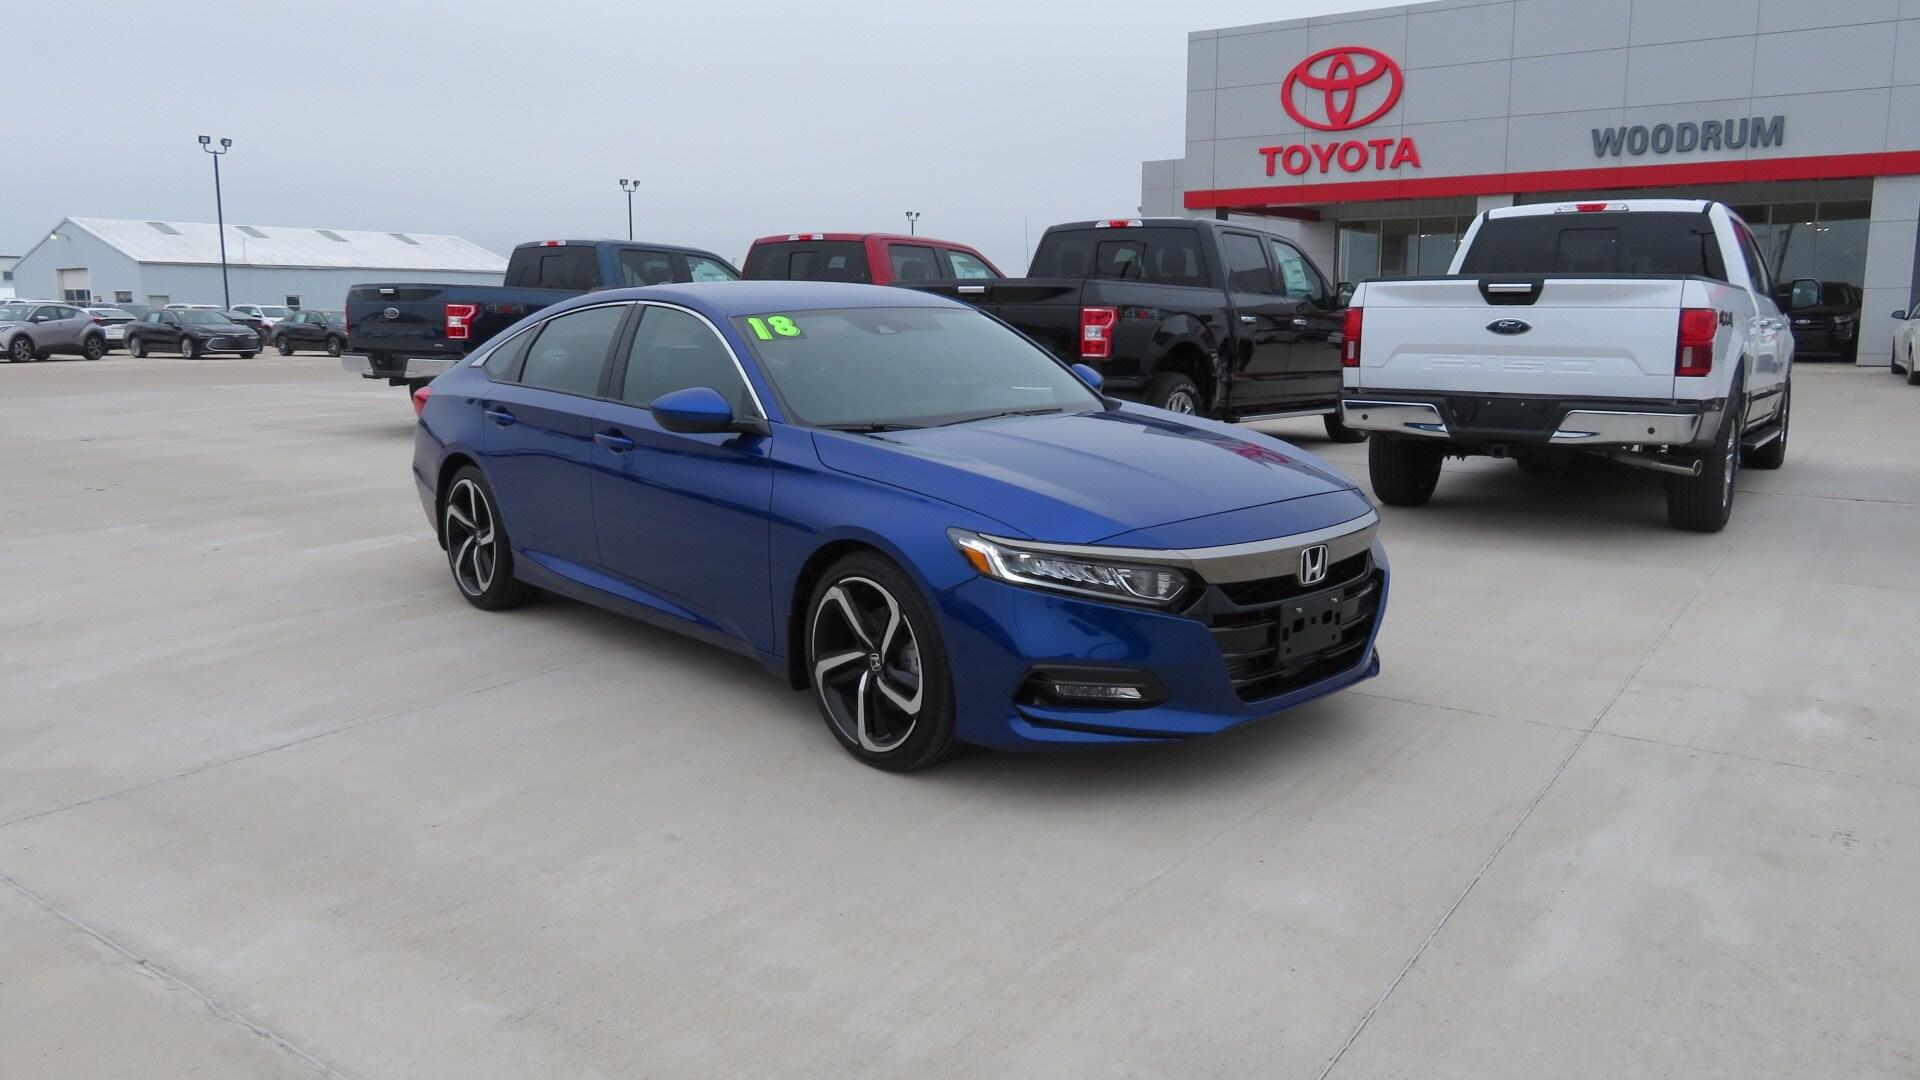 Used 2018 Honda Accord For Sale   Macomb IL   1HGCV1F34JA258573